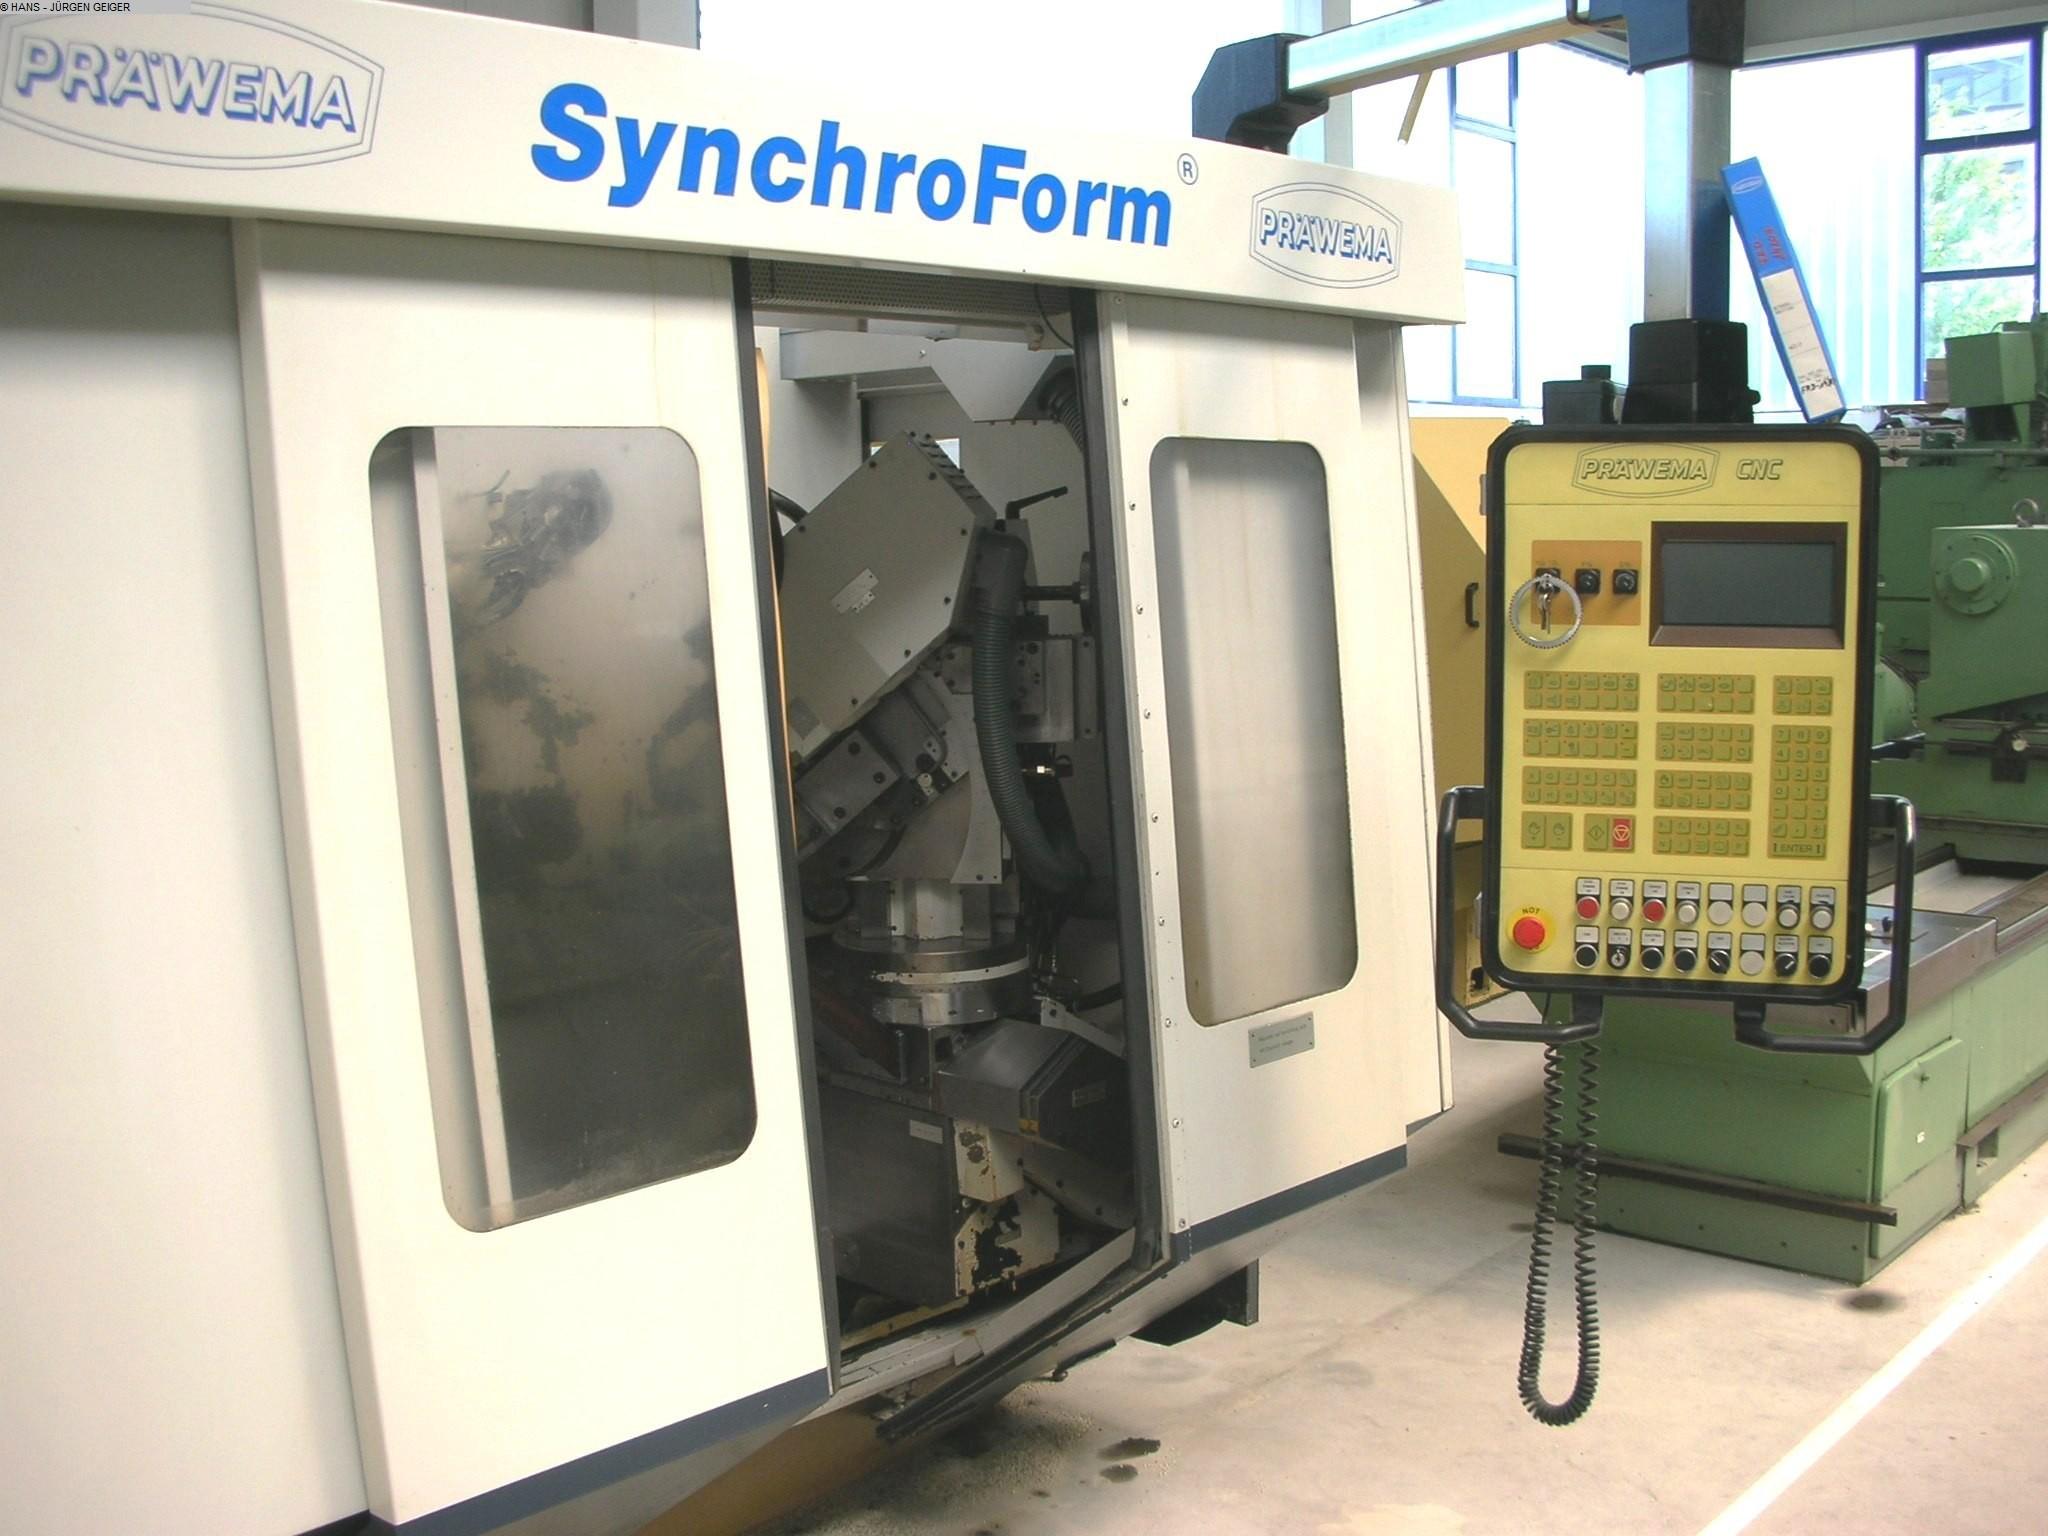 used Gear cutting machines Chamfering and Deburring Machine PRÄWEMA W 2 - 1 SYNCHROFORM